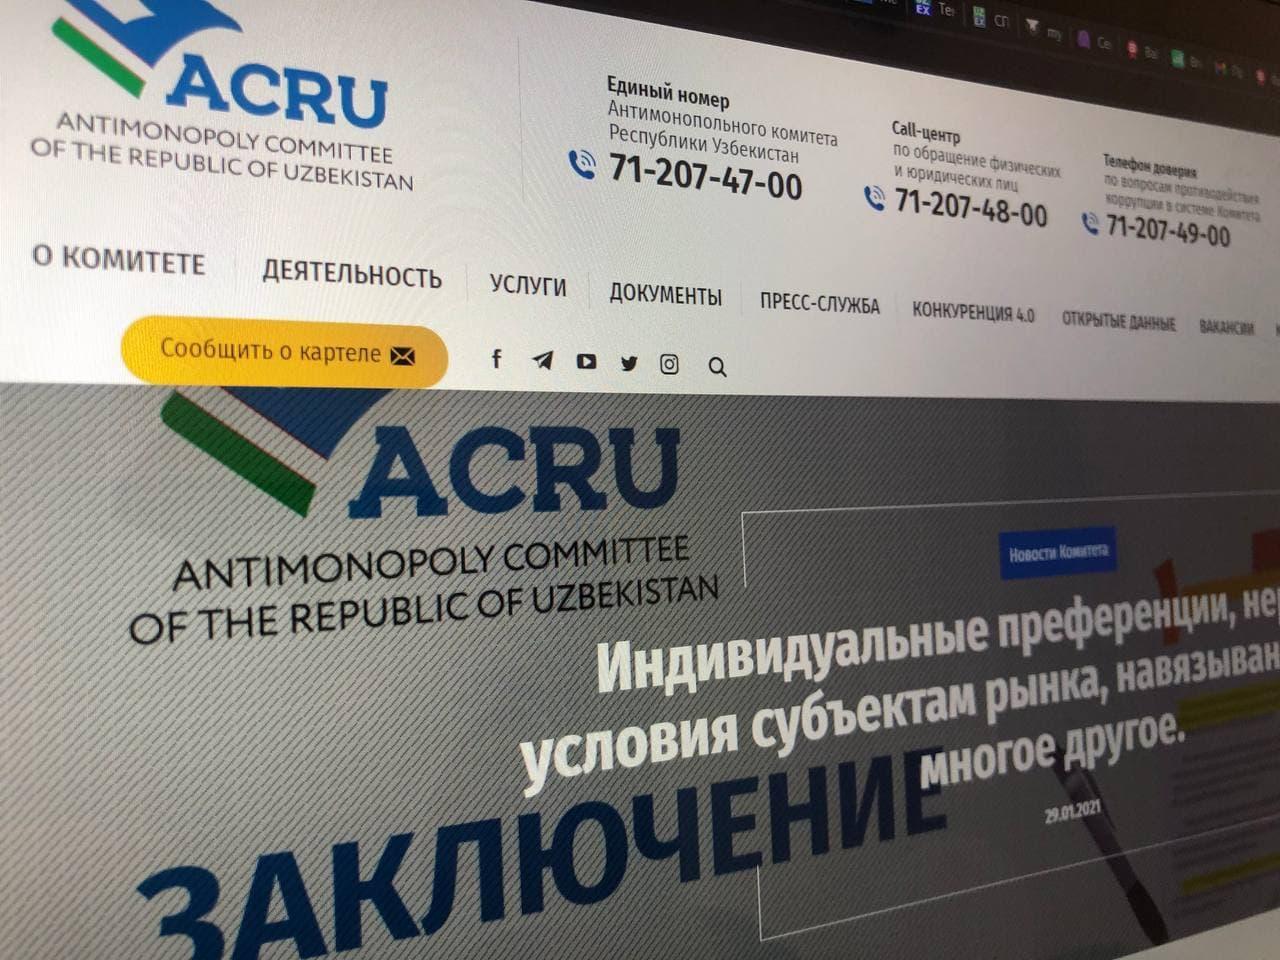 Антимонопольный комитет объявил конкурс почти на 1 млрд сумов